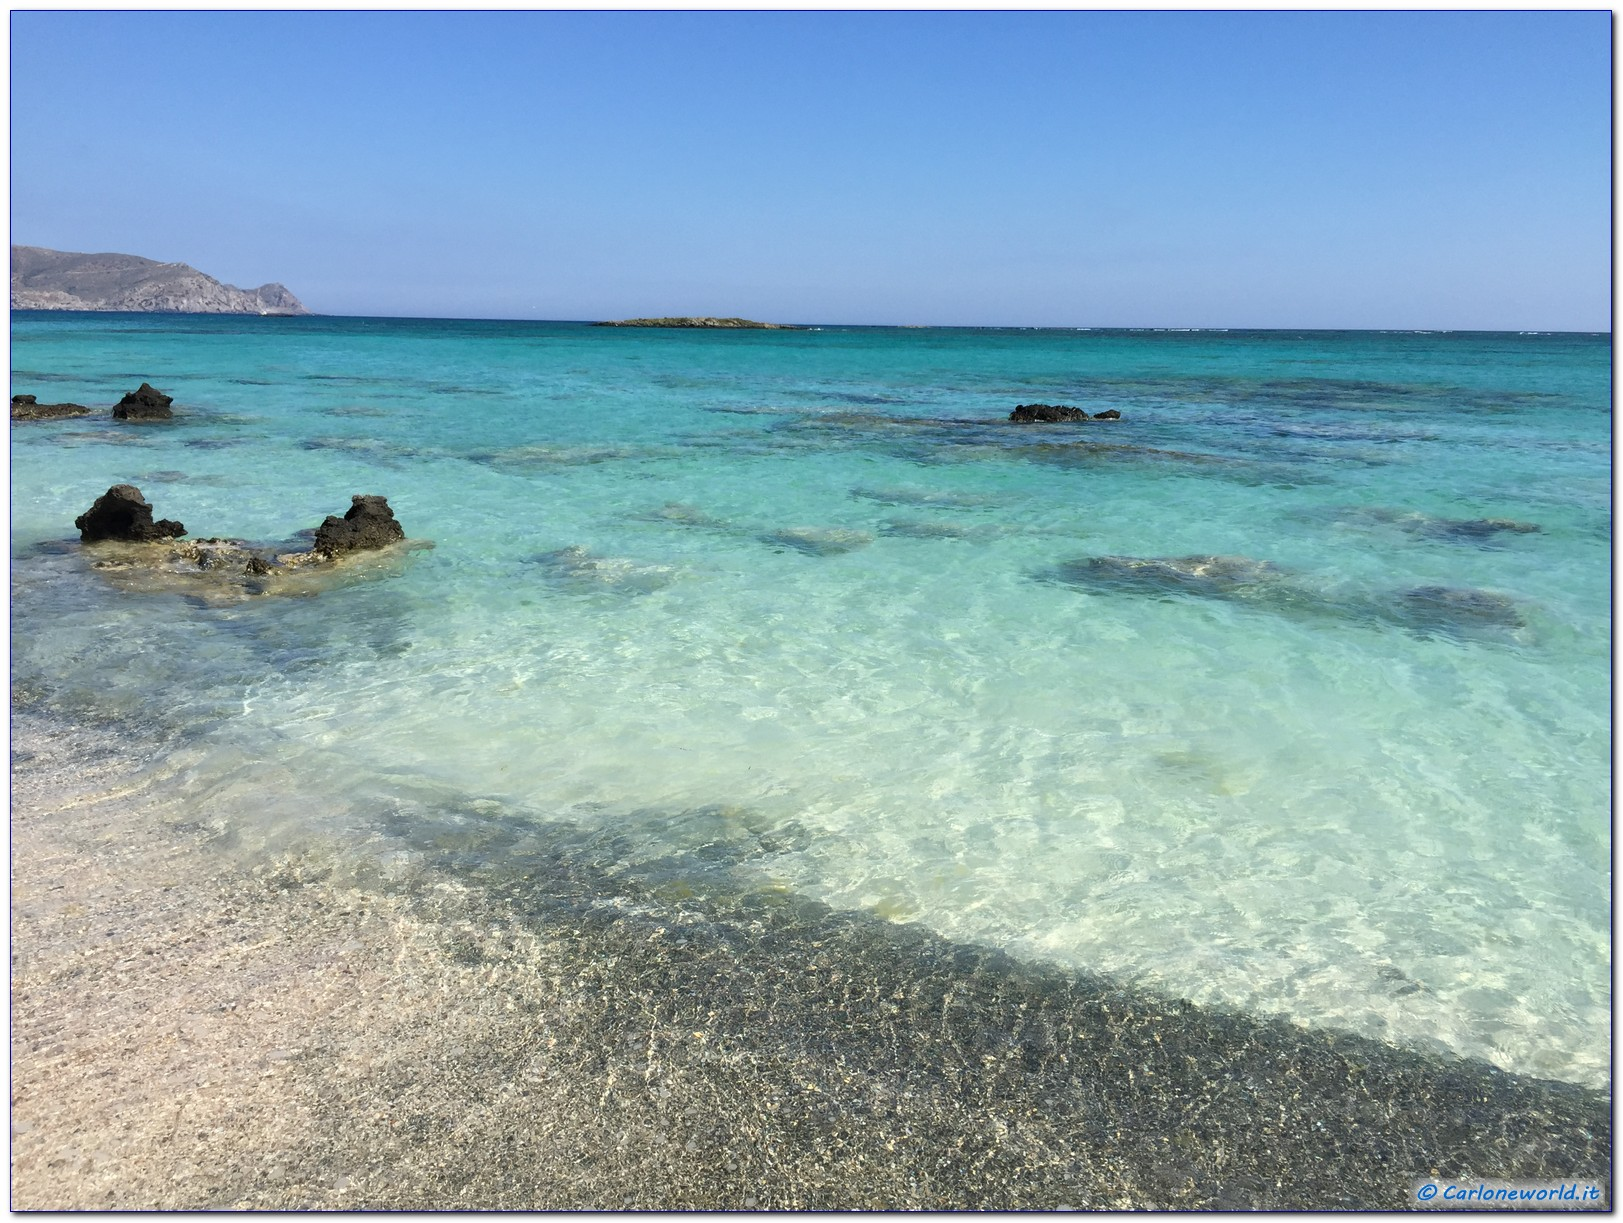 Creta Mare Elafonisi,elafonisi mare,elafonisi mare,creta spiaggia elafonisi